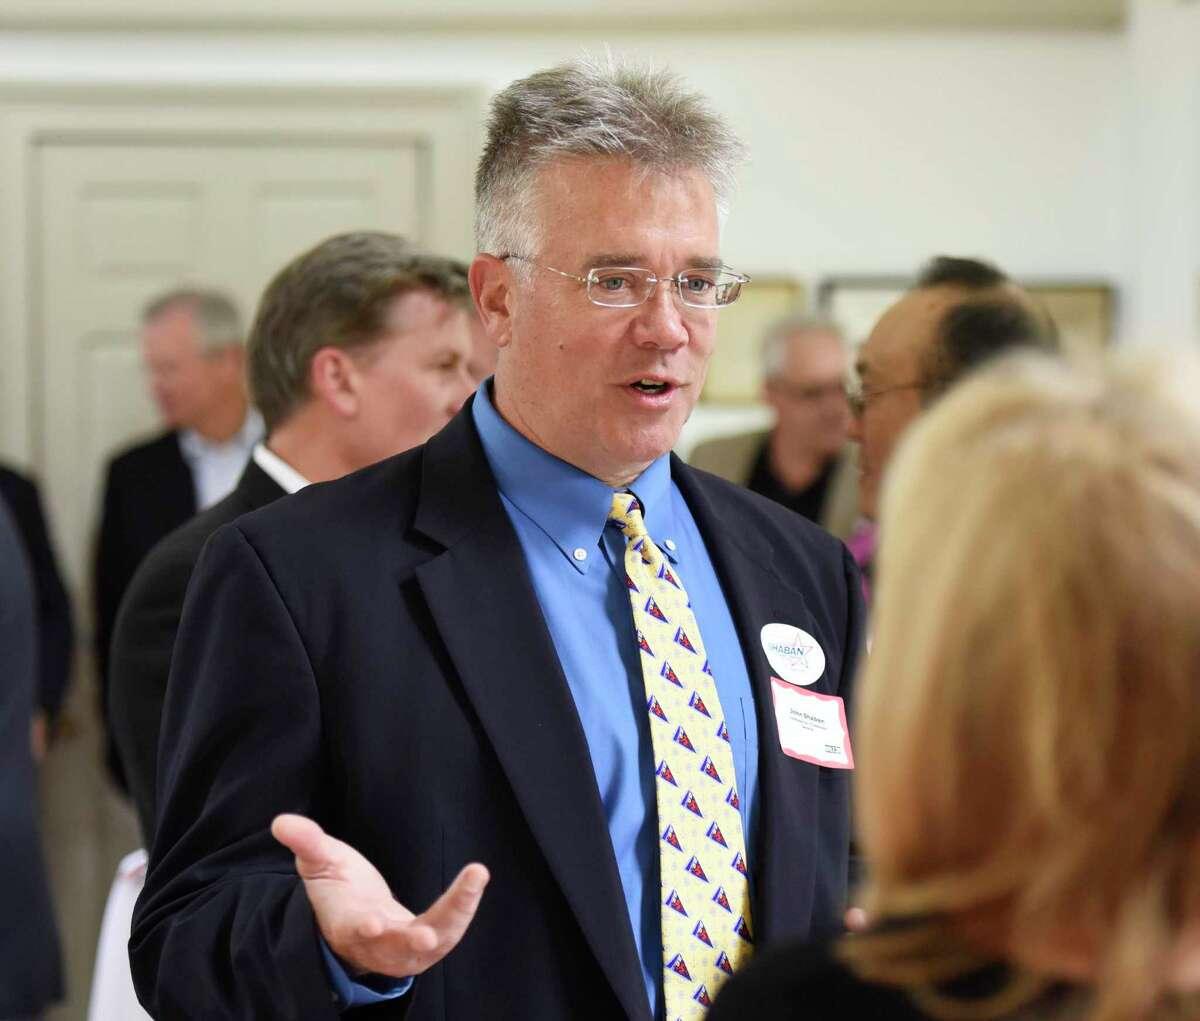 Former state legislator John Shaban is running on the Republican ticket for first selectman in Redding.